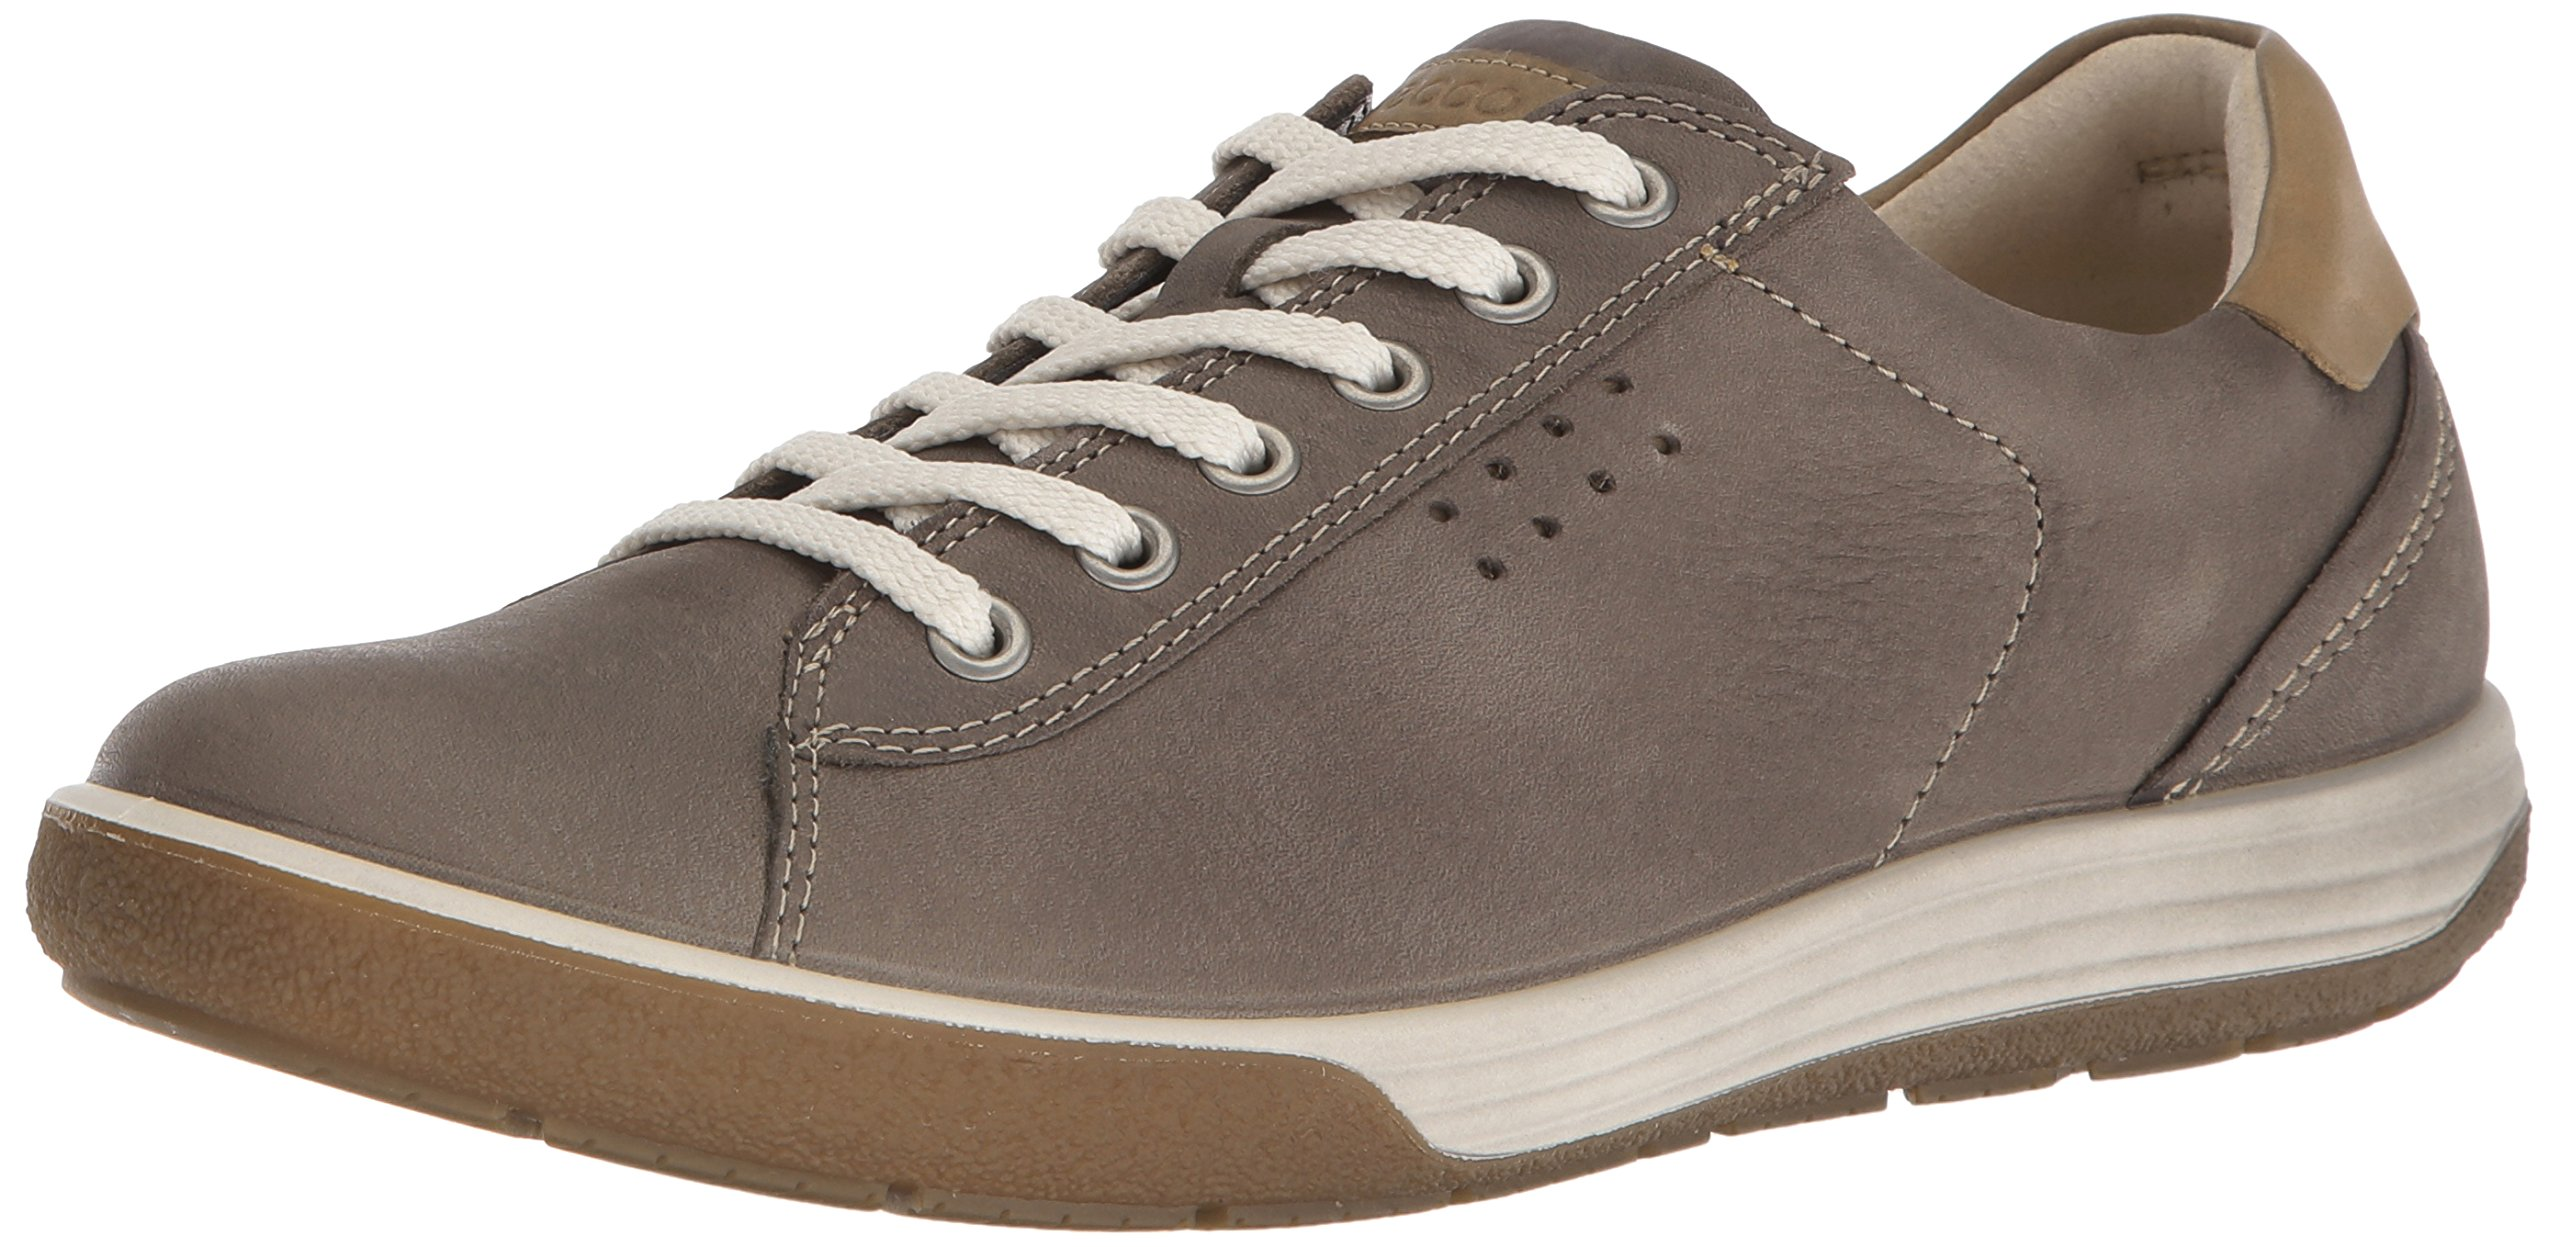 Ecco Footwear Womens Chase II Lace Shoe, Warm Grey, 37 EU/6-6.5 M US